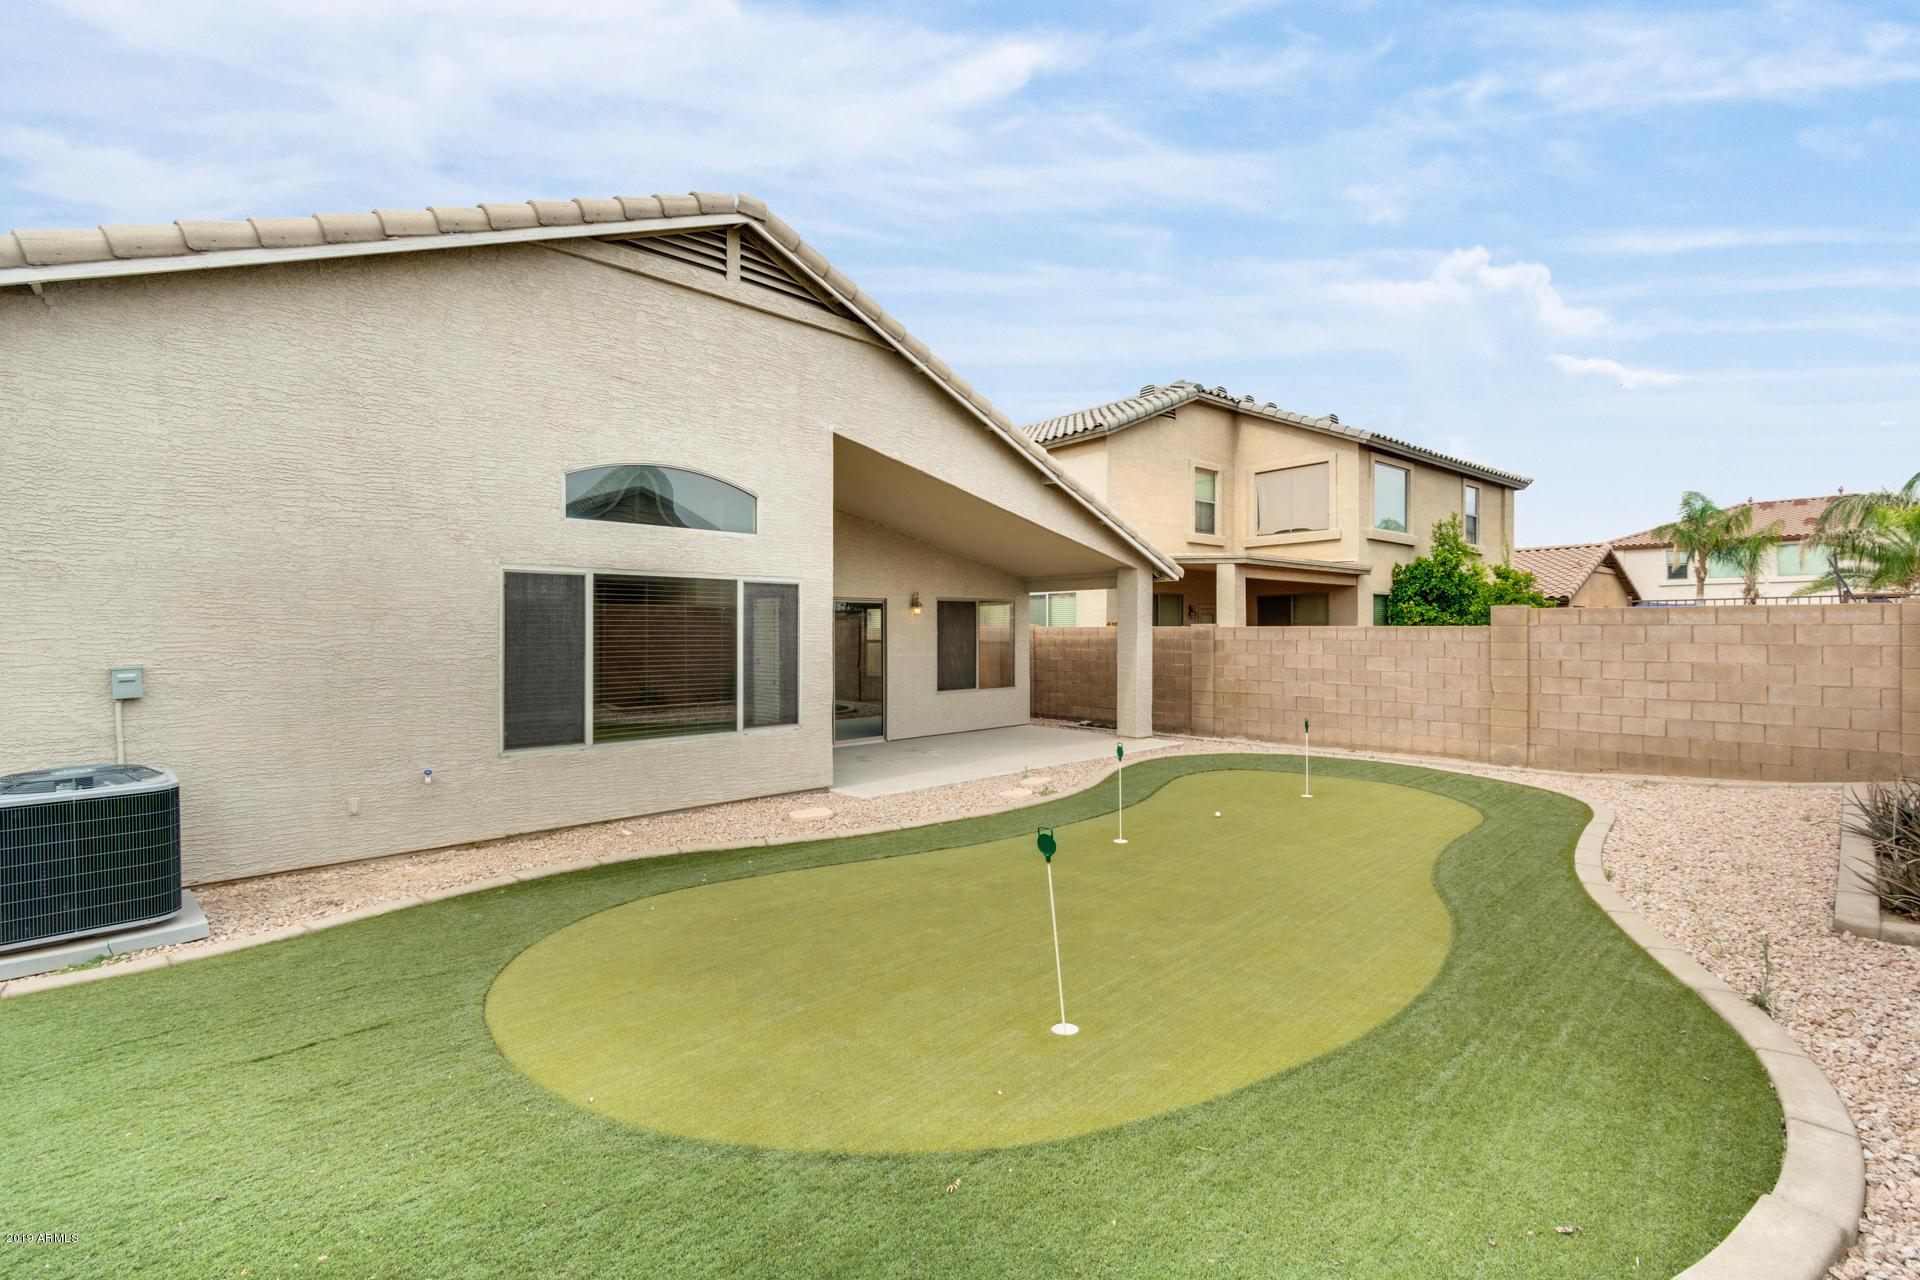 MLS 5924104 4809 W ALICIA Drive, Laveen, AZ 85339 Laveen AZ Cheatham Farms